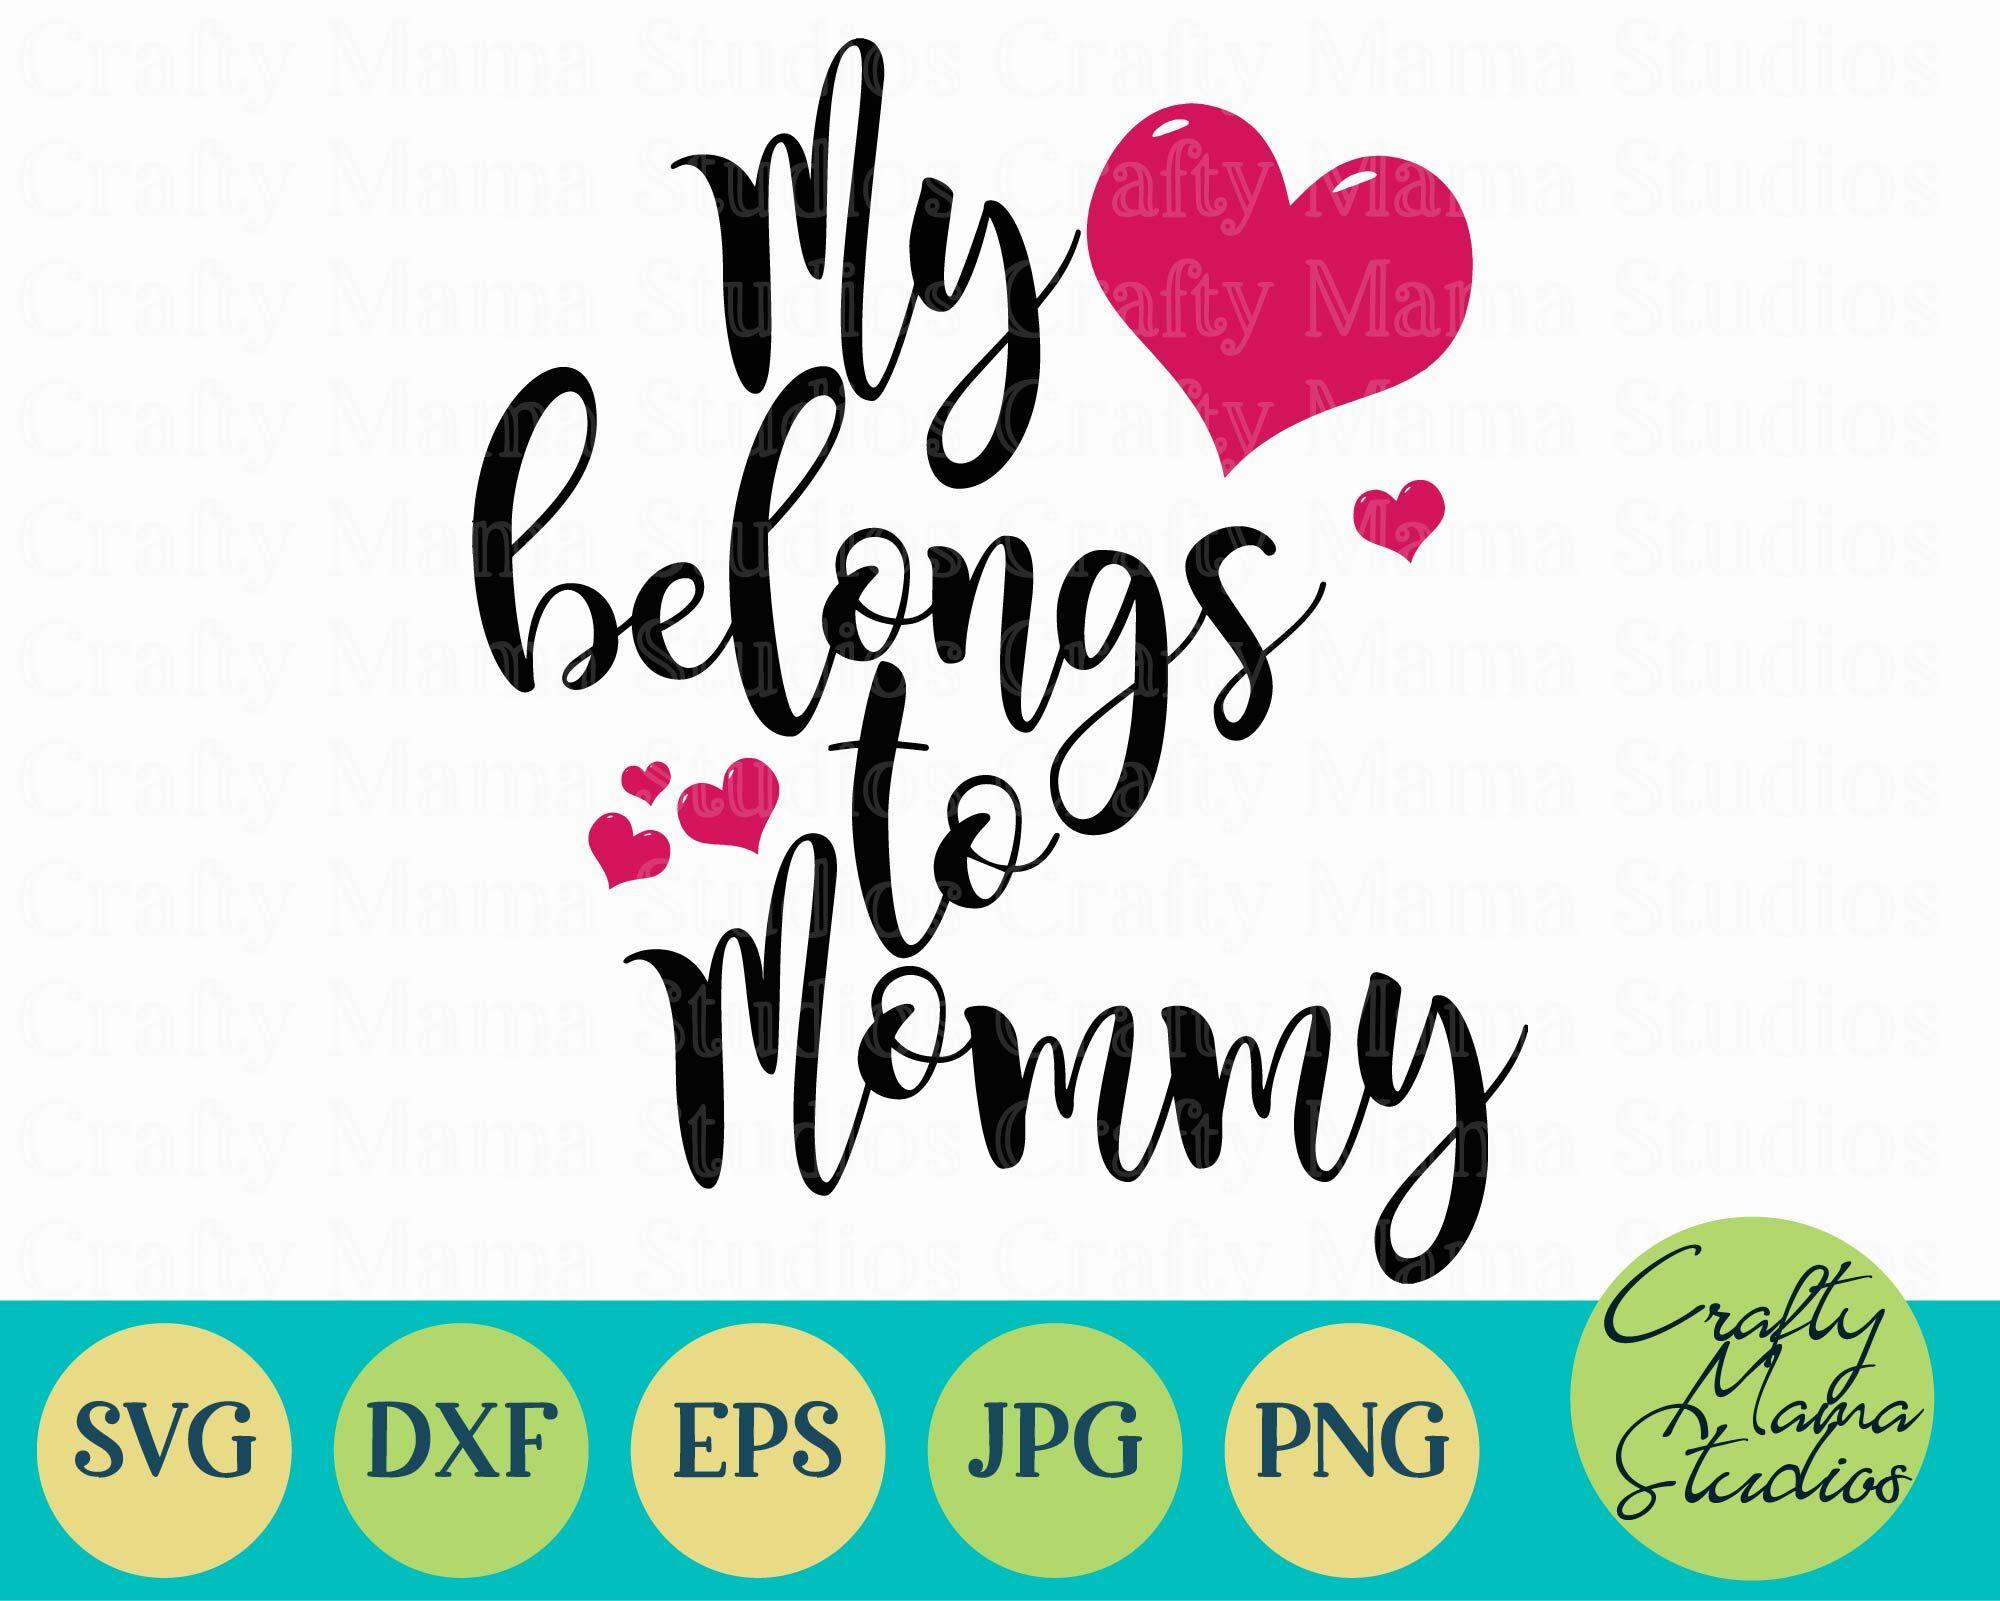 My Heart Belongs To Mommy Svg Mom Life Svg Mom Svg By Crafty